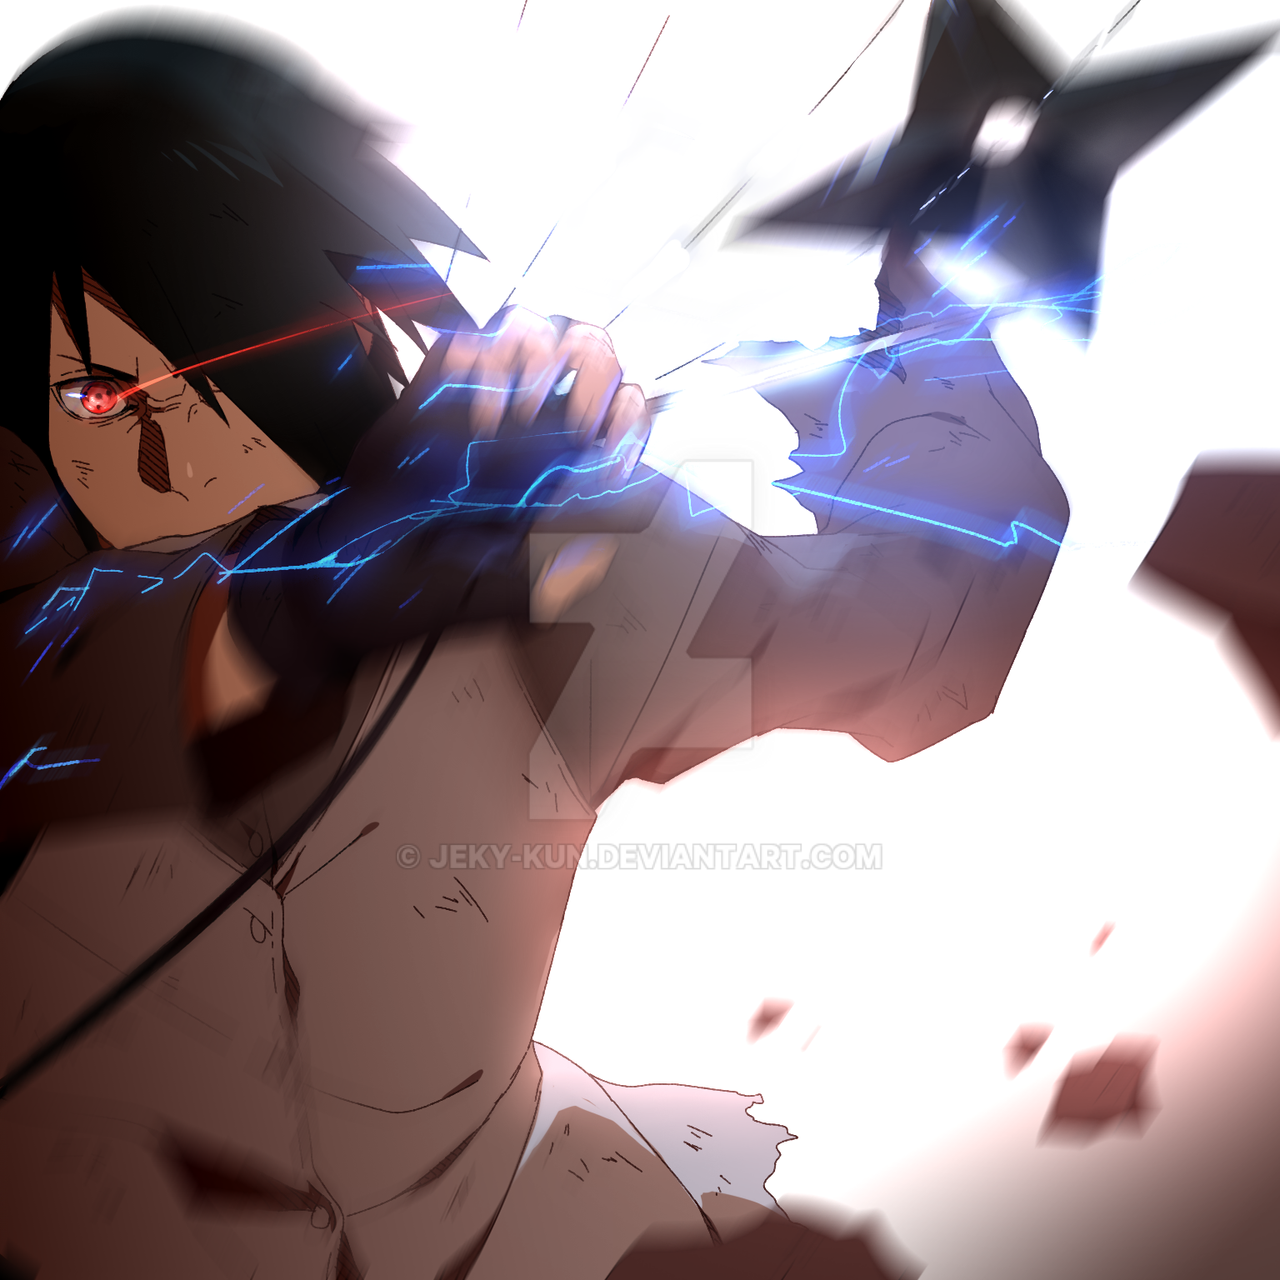 Sasuke Wakes Up By Uendy On Deviantart: Boruto Episode 65 Tribute (Sasuke FanArt) By Jeky-kun On